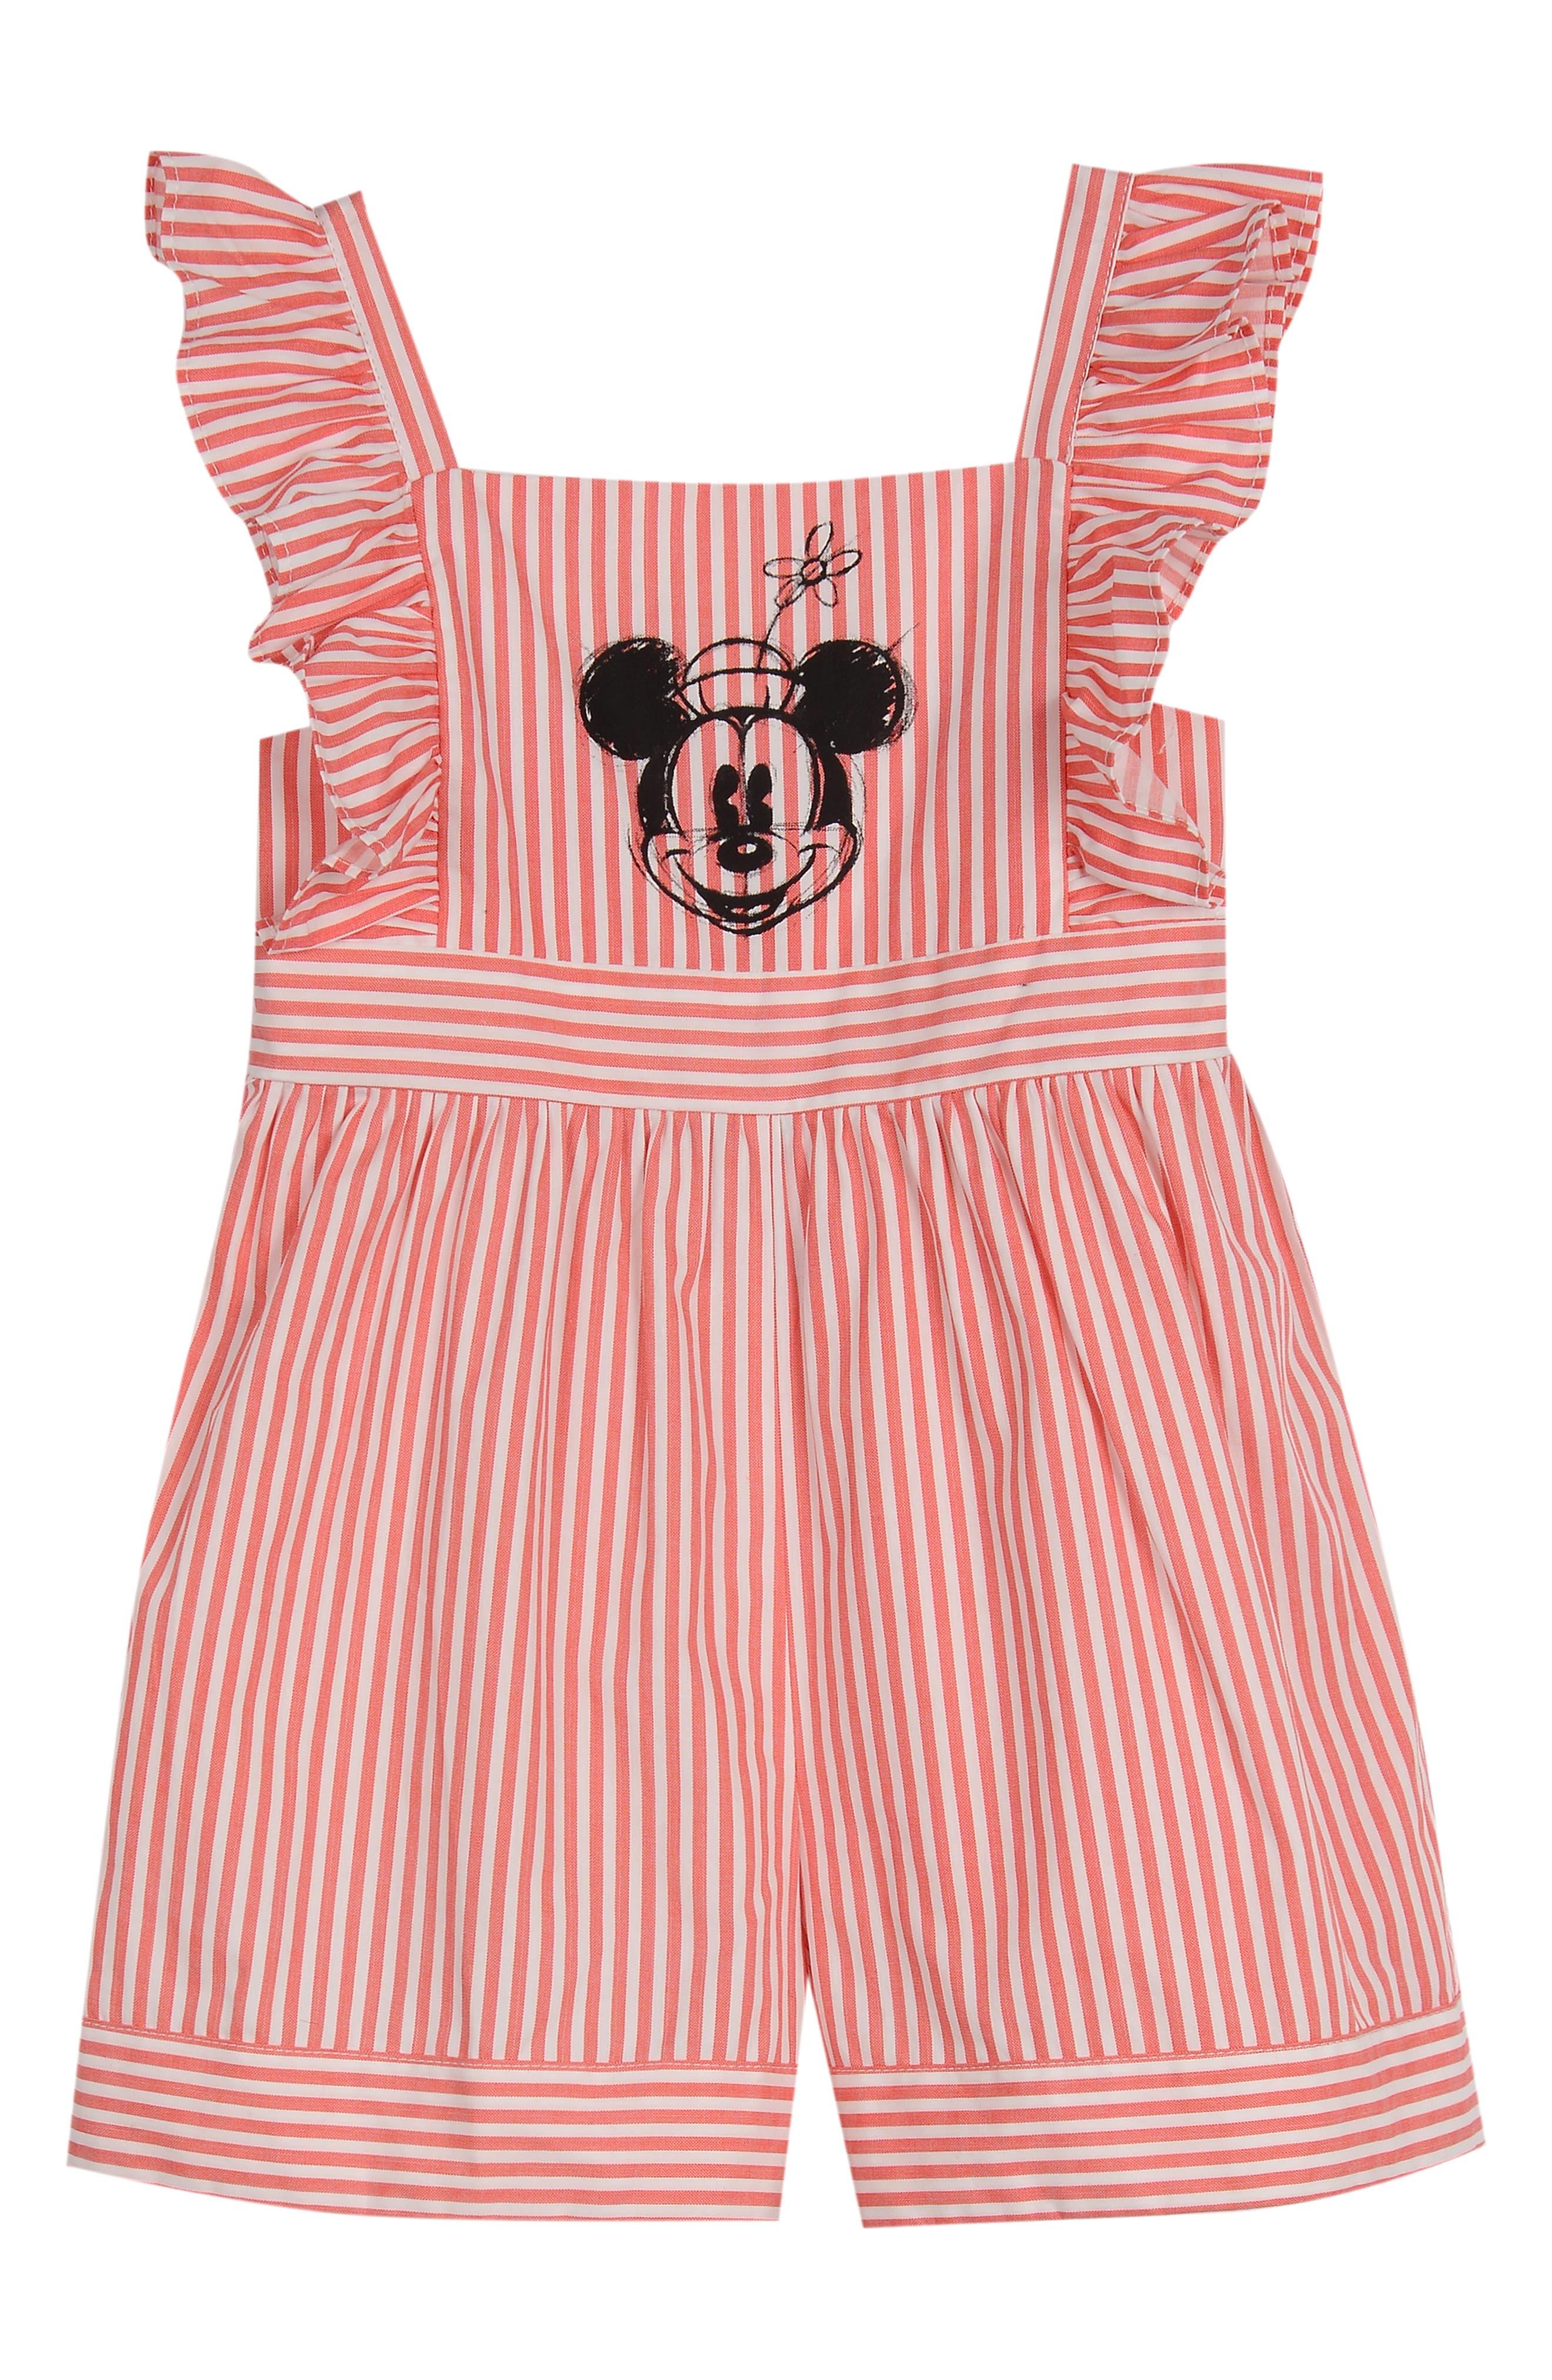 896fca35c disney minnie mouse